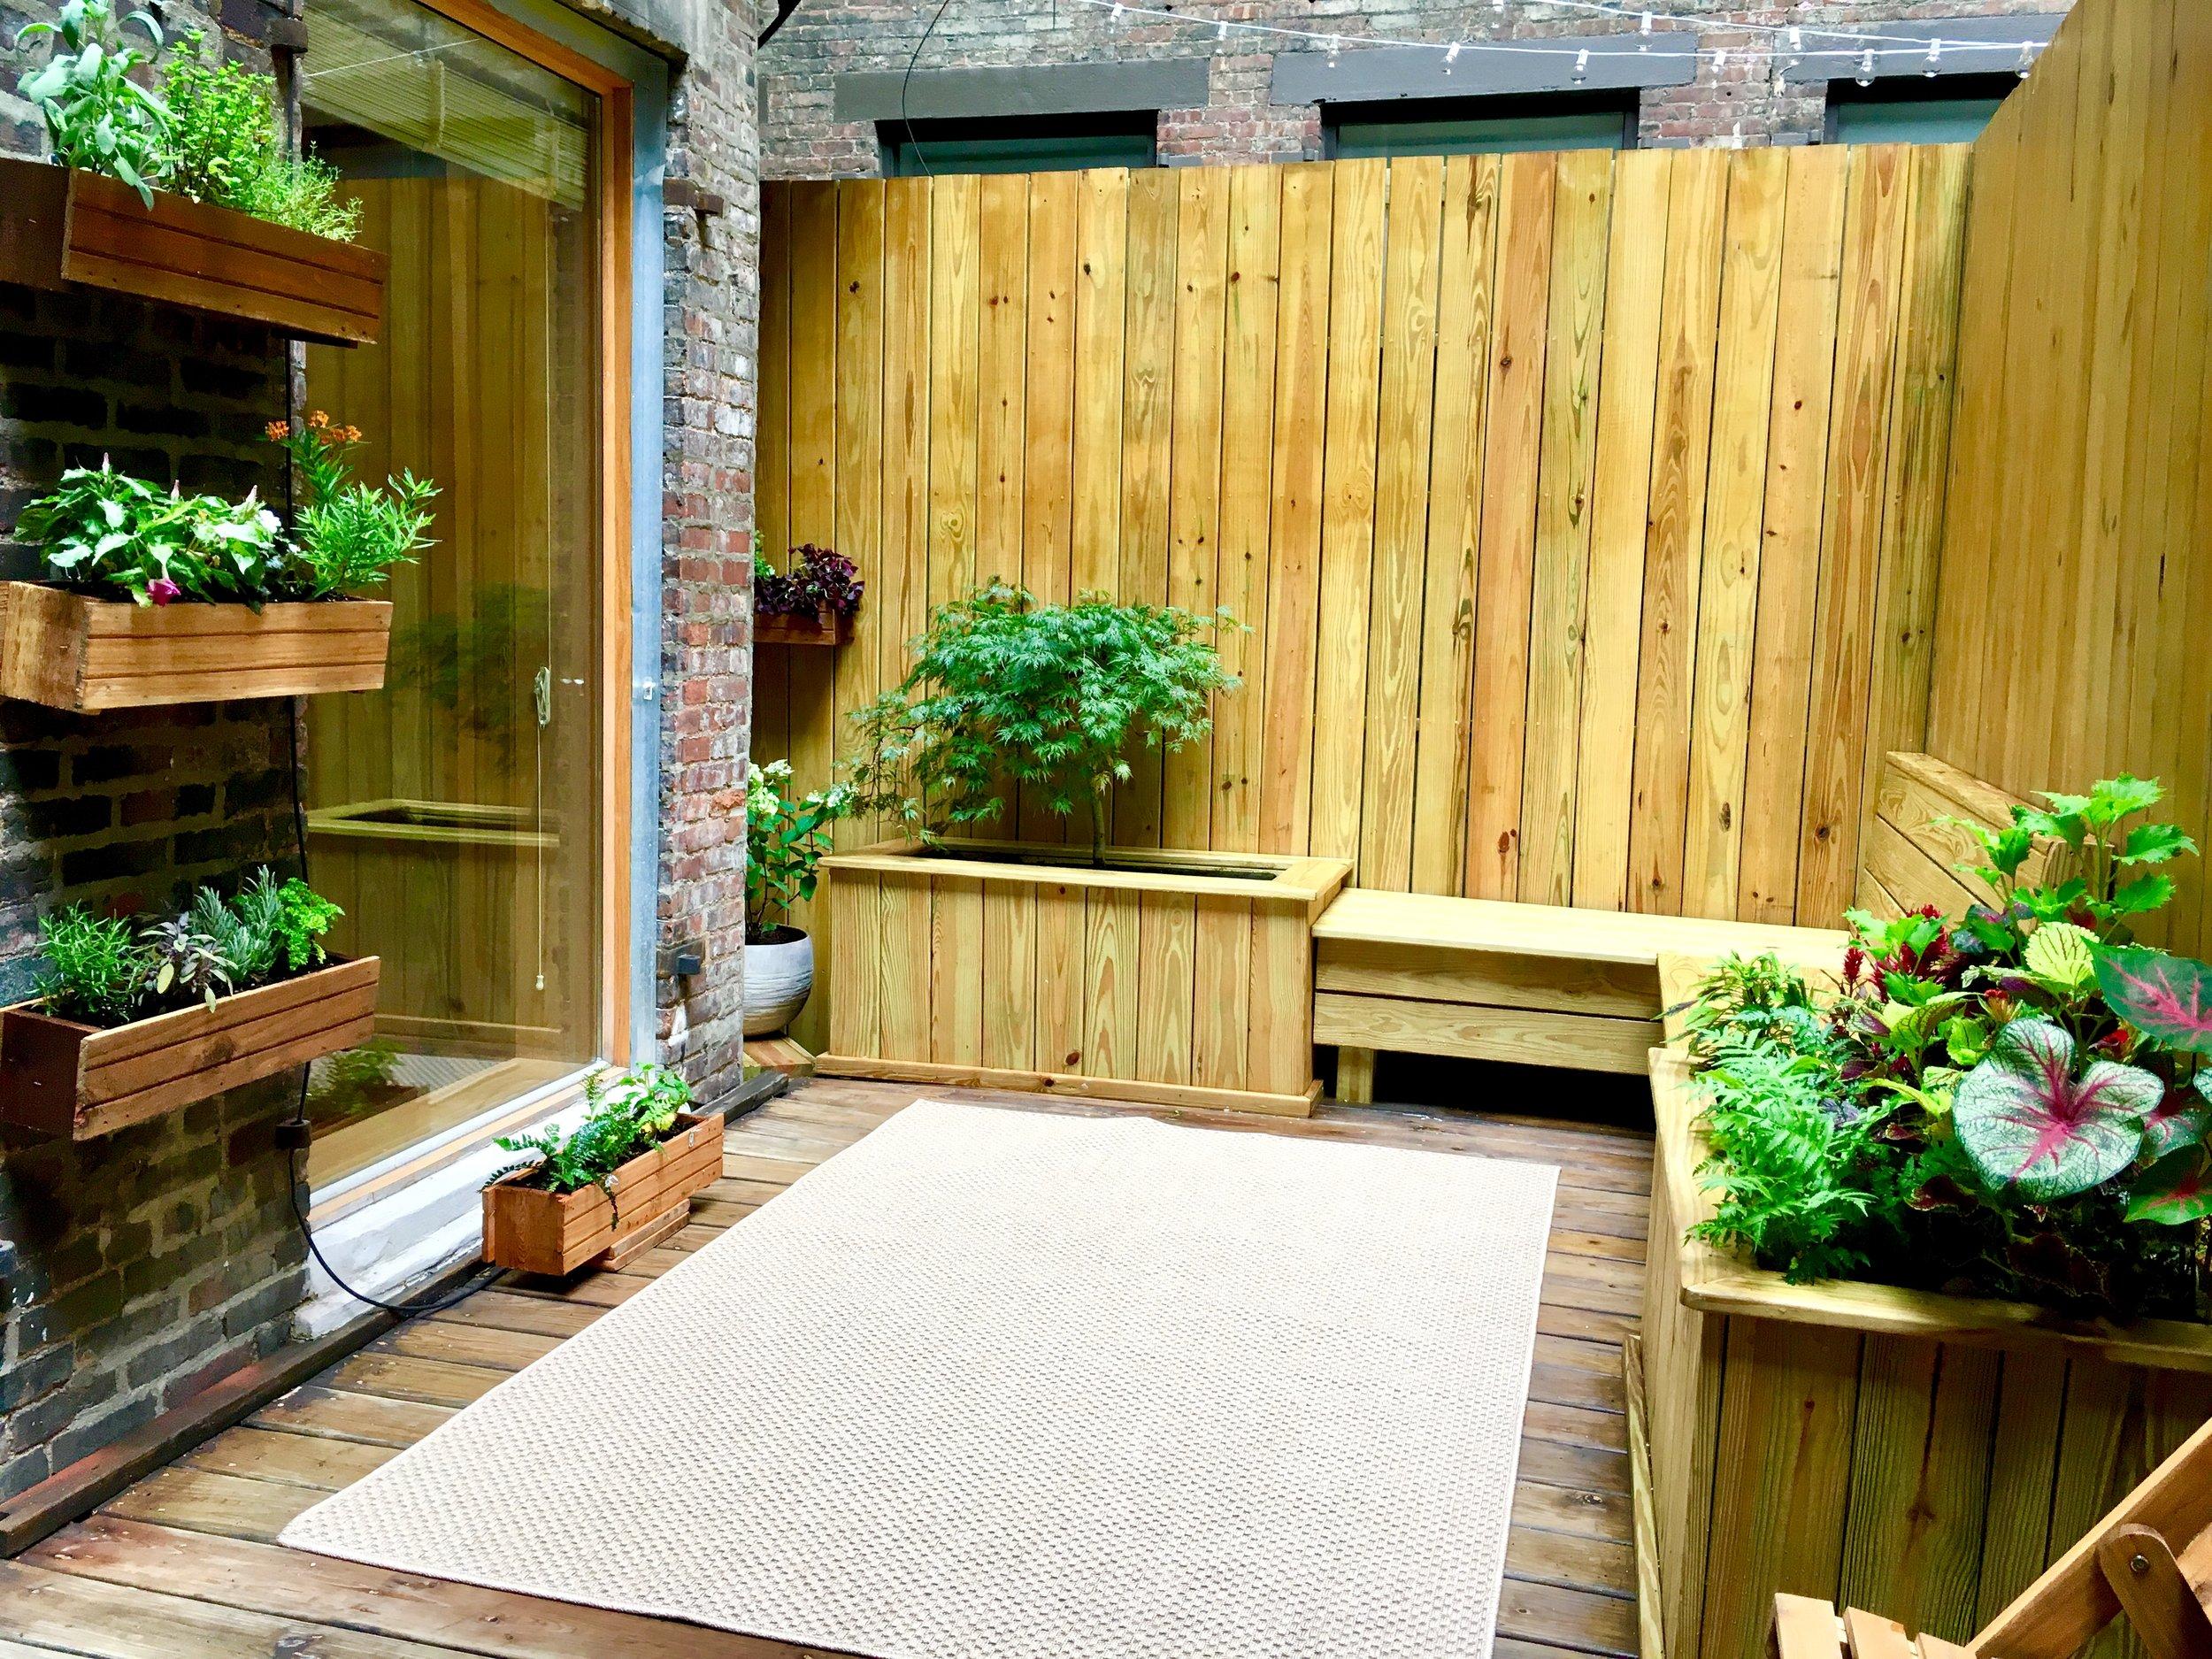 padma-nyc-patio.jpg